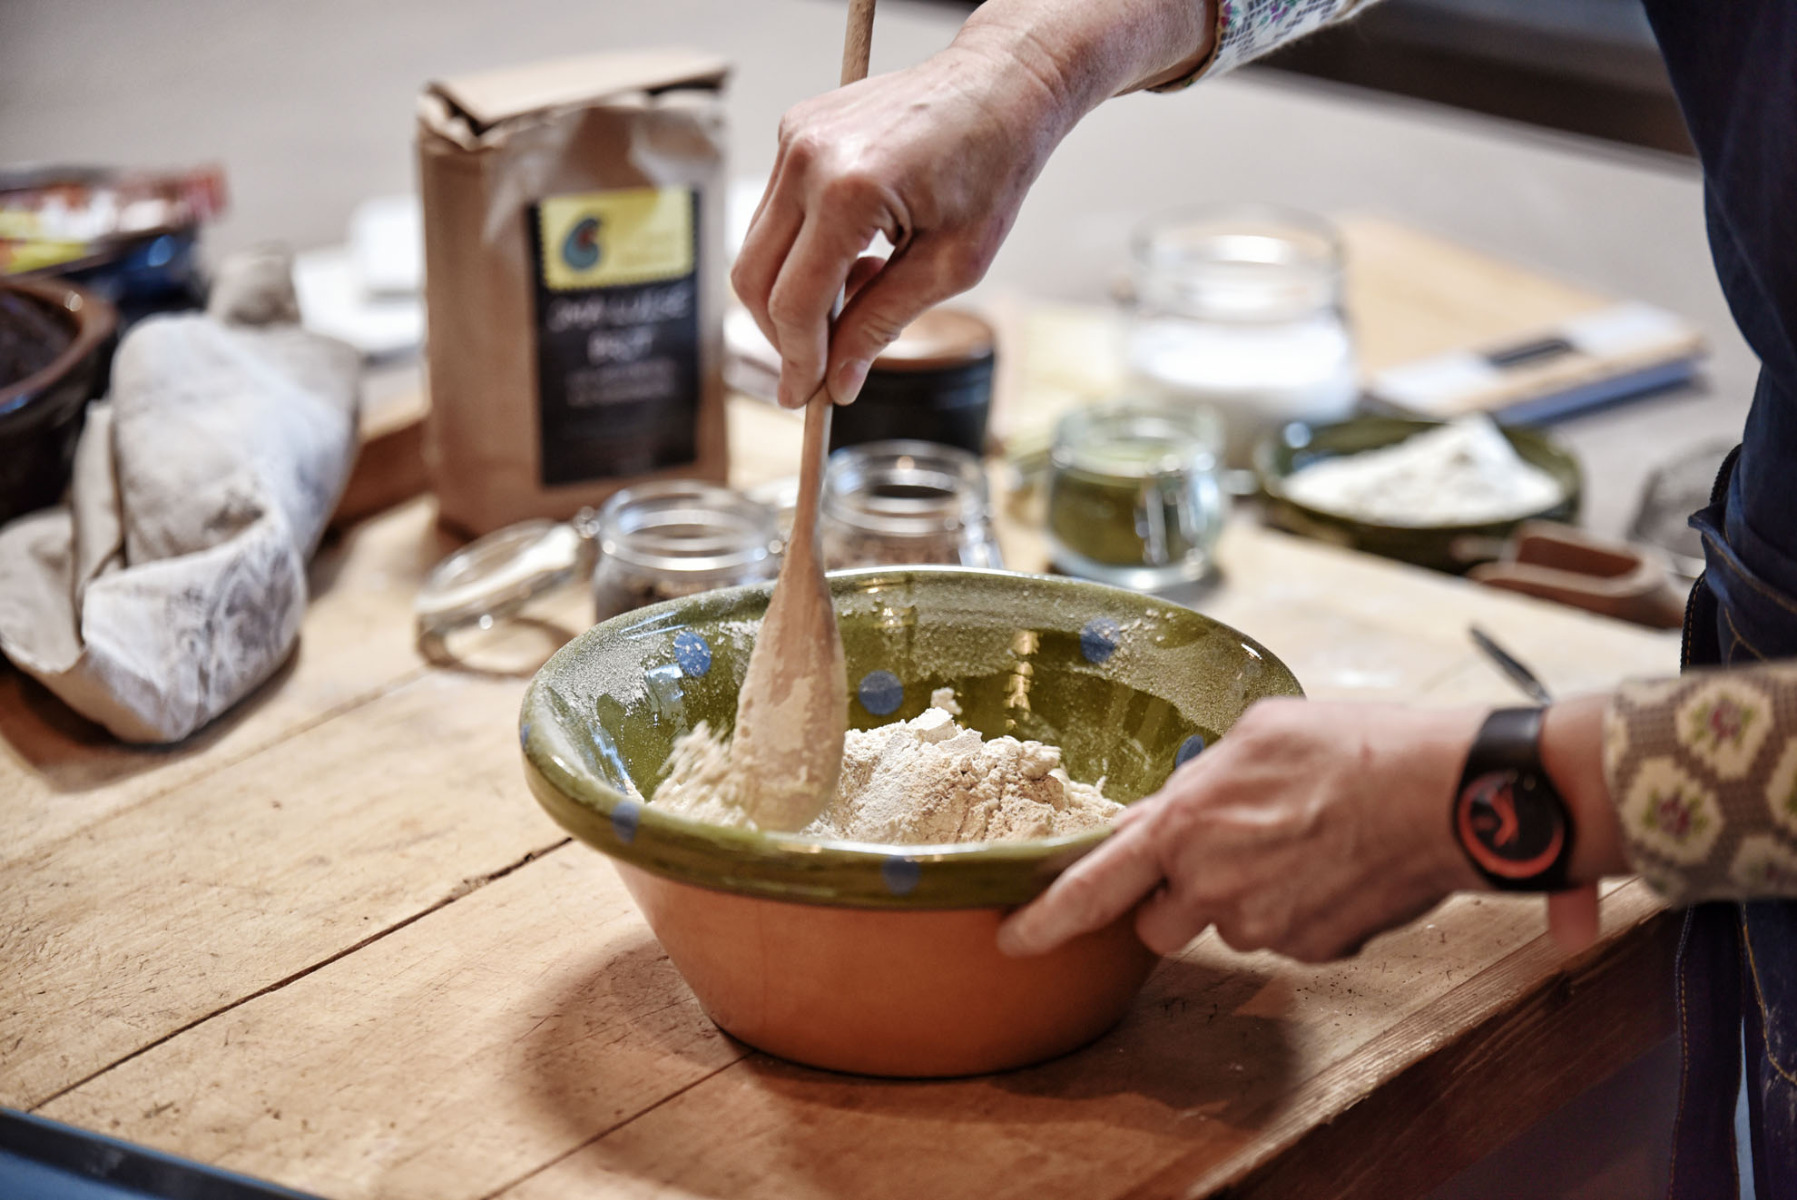 Brotteig-Zubereitung - Holzlöffel rühren